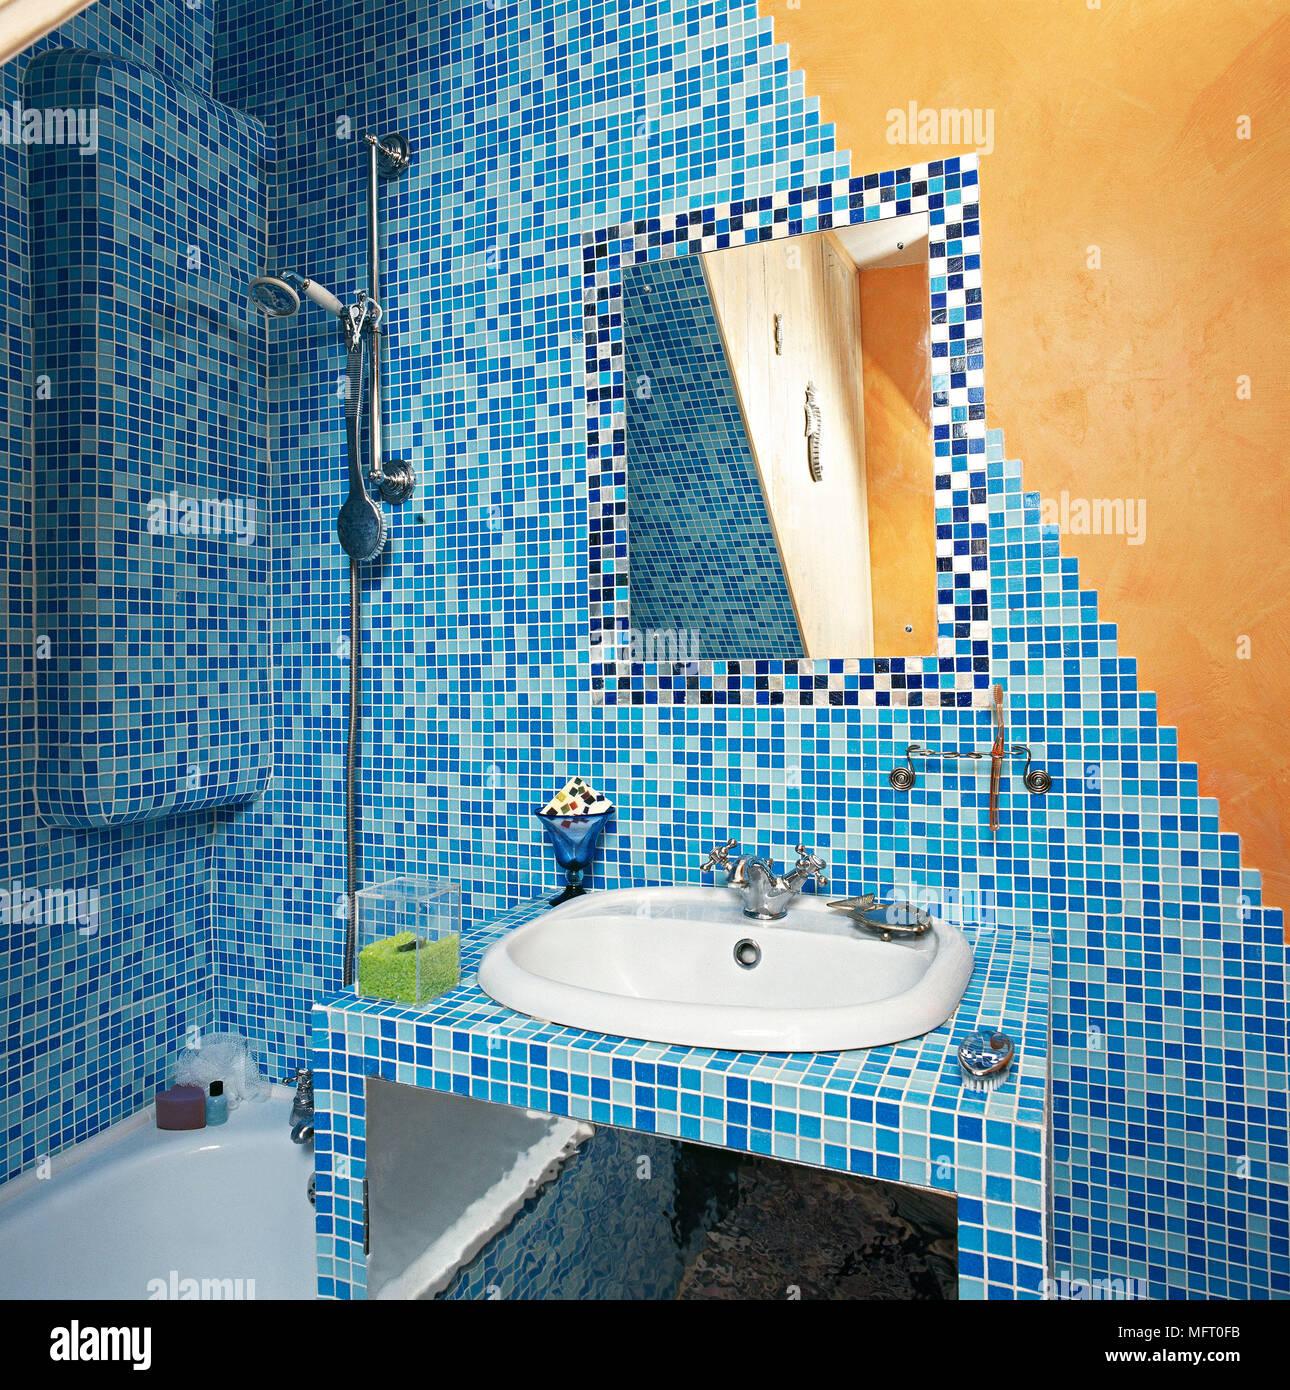 https www alamy com artistic bathroom with blue mosaic tiled walls bathtub sink and mirror image181850799 html